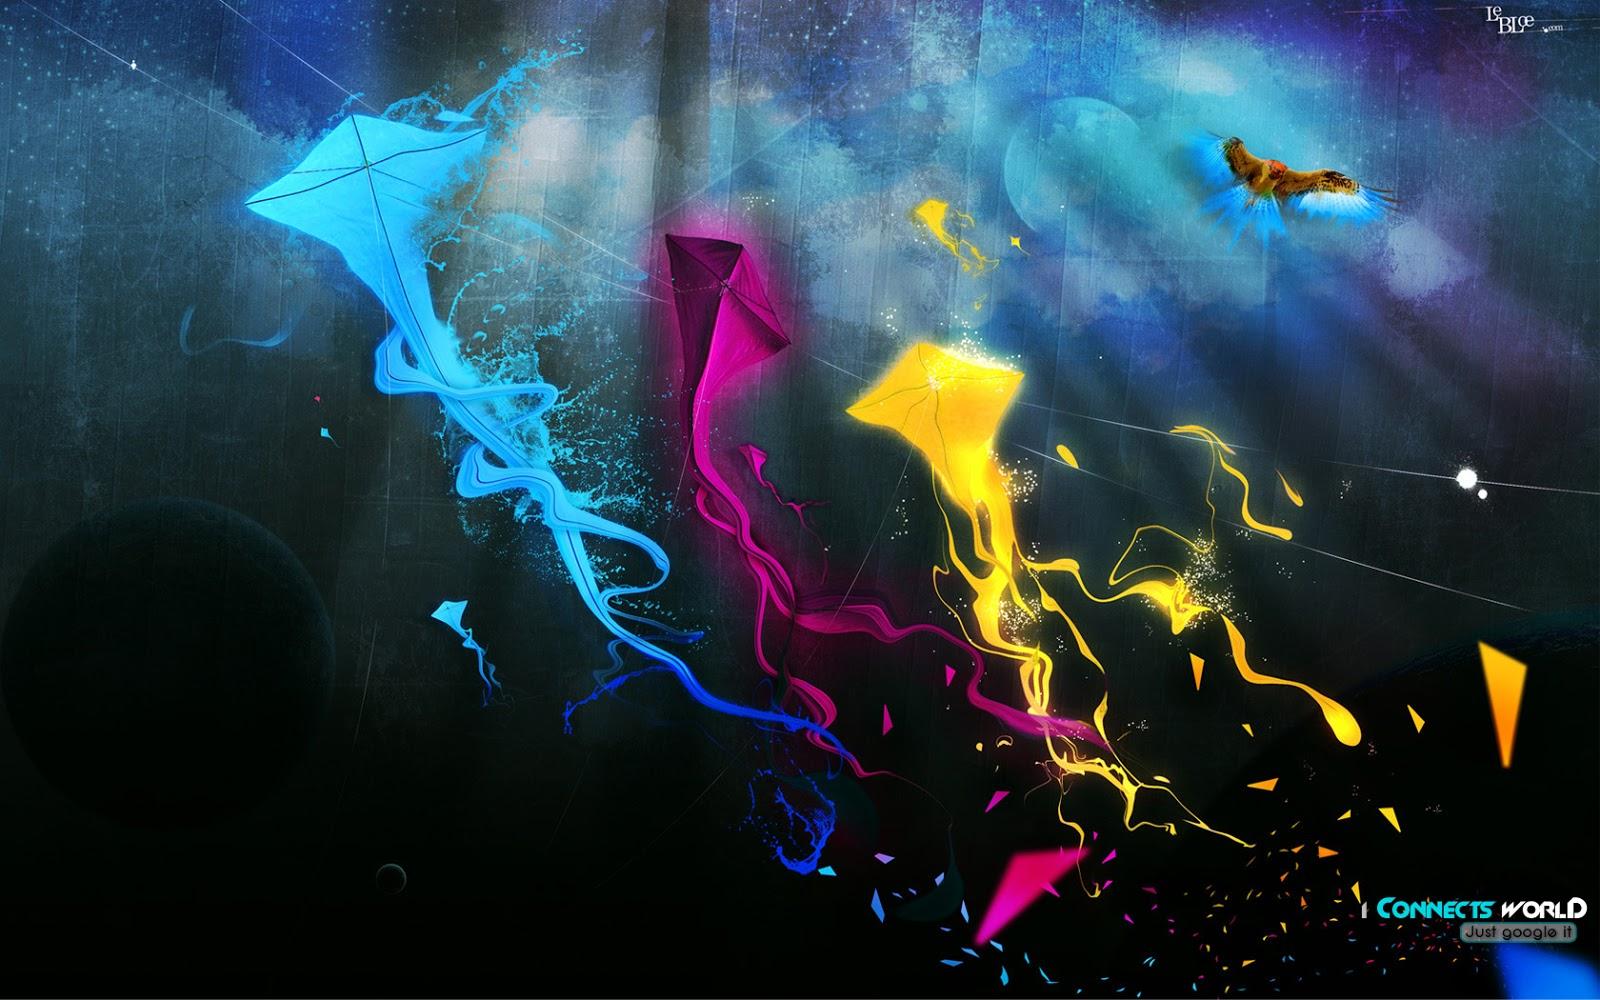 http://4.bp.blogspot.com/-DT5ddHH2BwI/URd3OSti3YI/AAAAAAAAC2A/Pv193XXwzVI/s1600/1680x1050_Zixpk_HD_Wallpaper_208.JPG